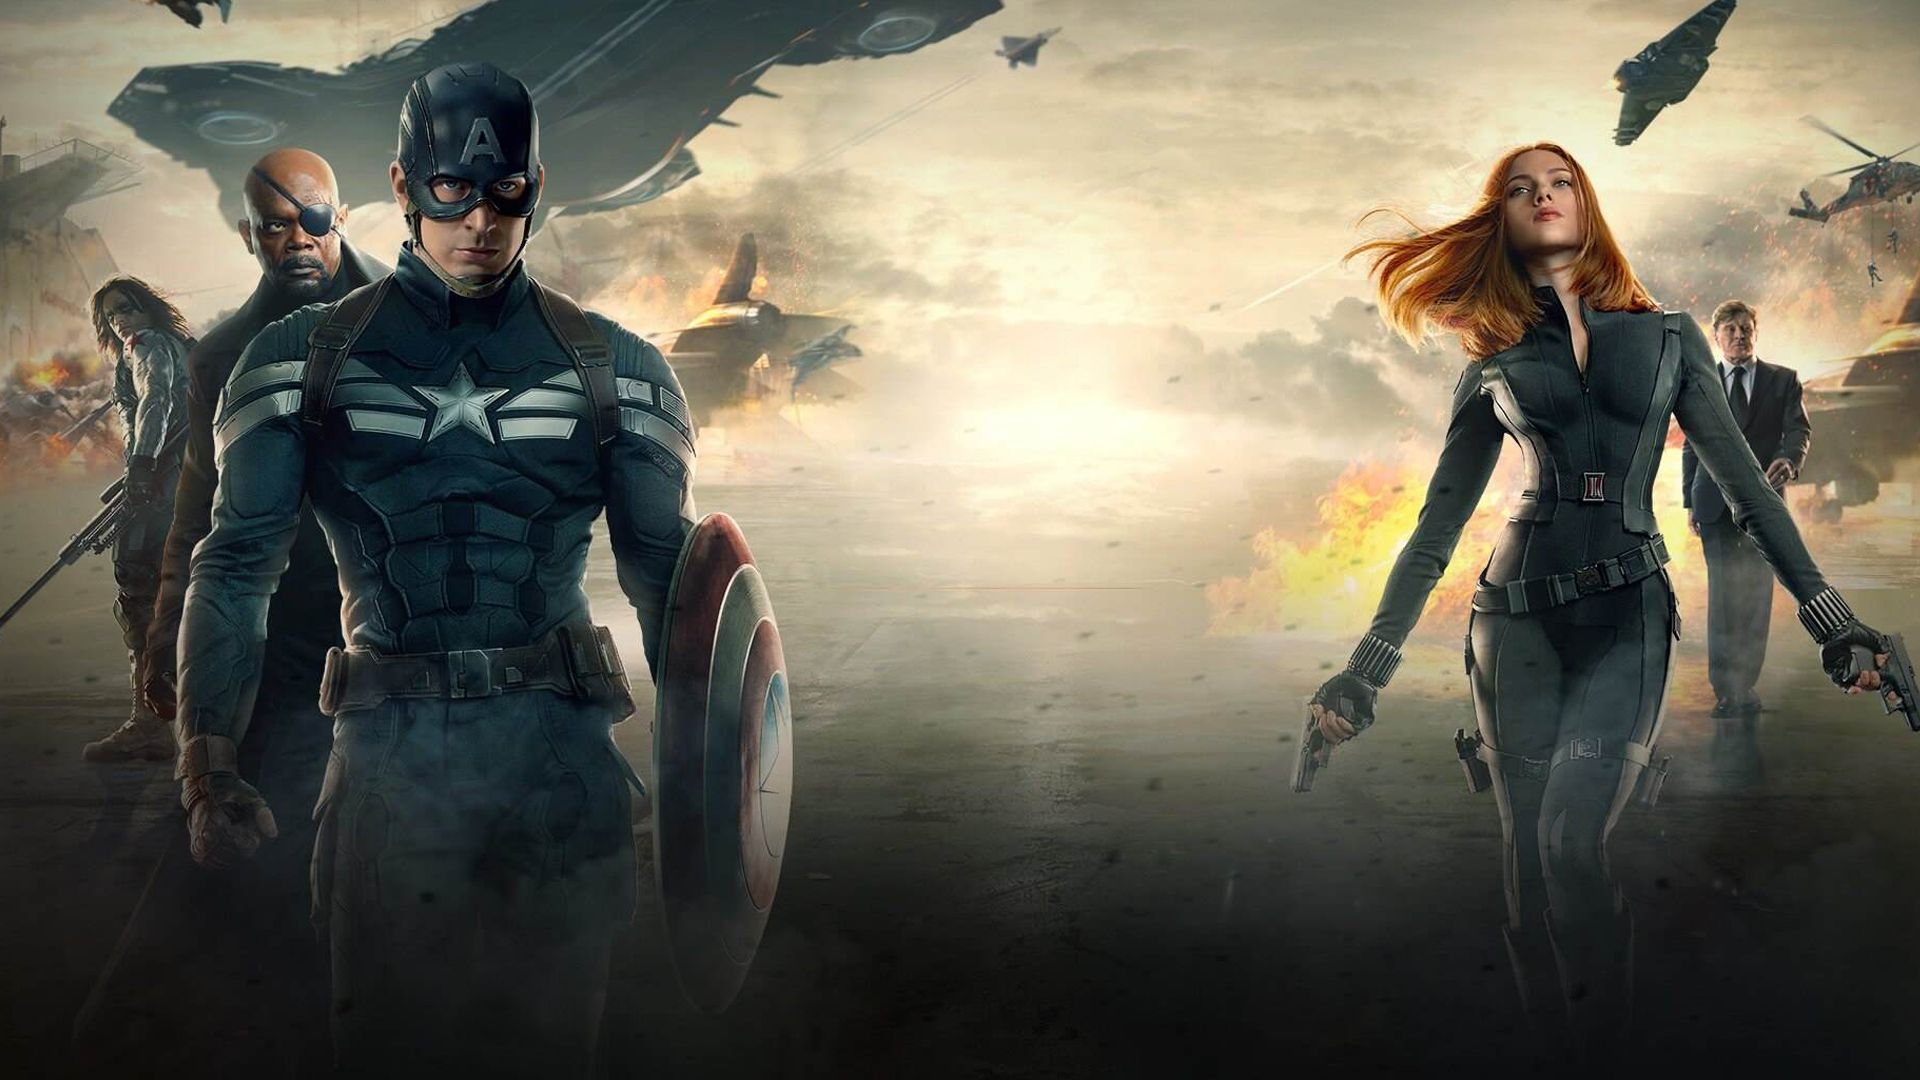 Captain America The Winter Soldier Movie Hd 1920x1080